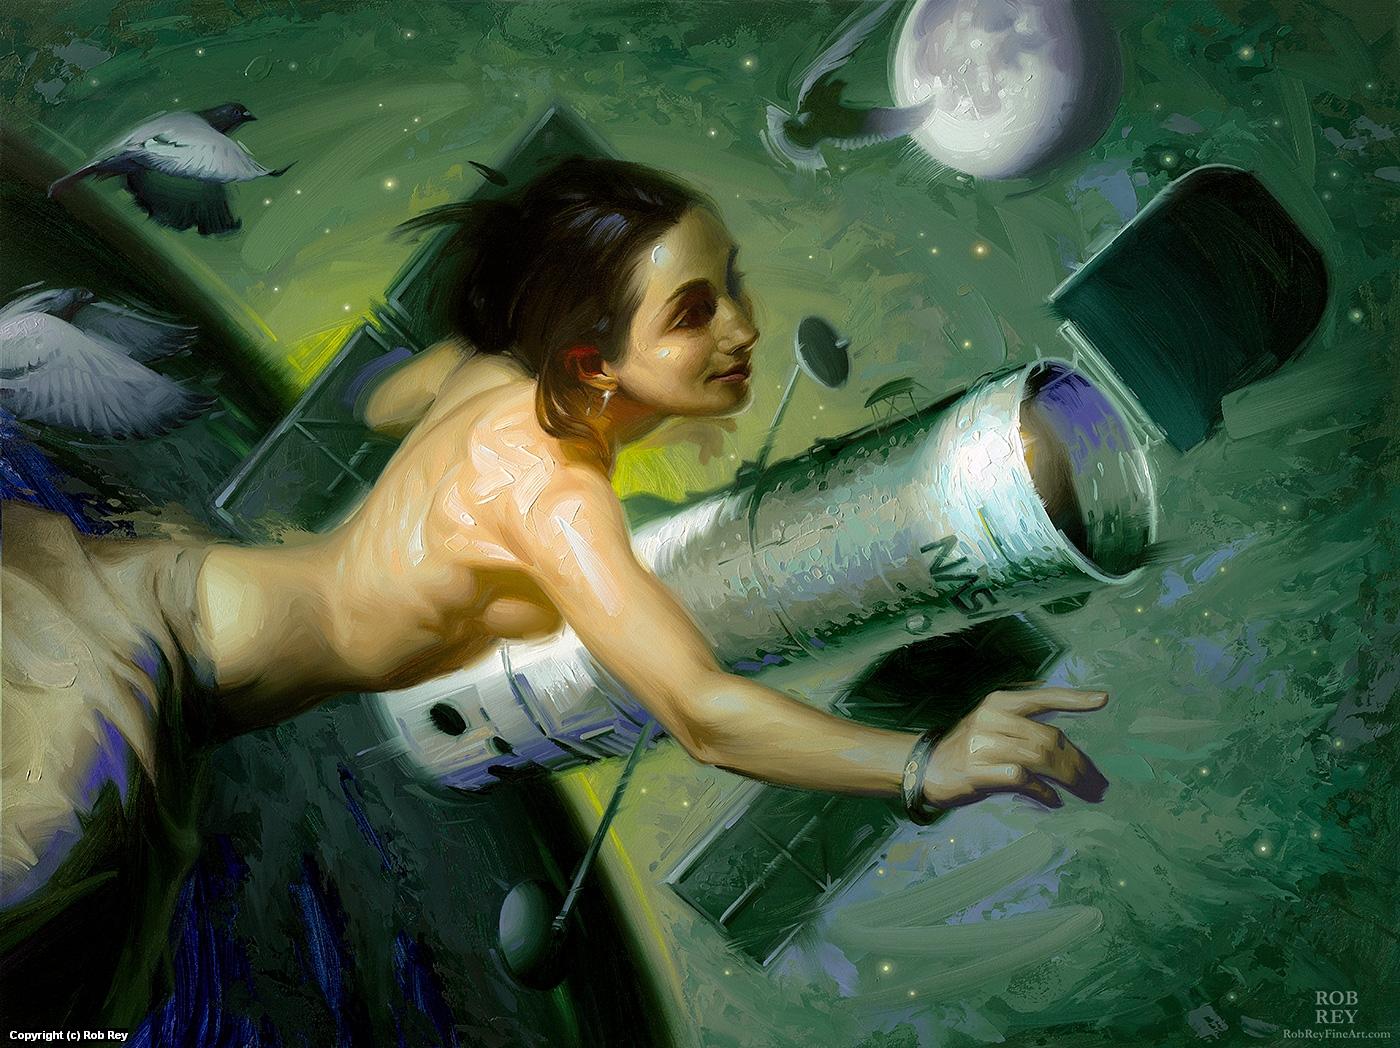 Hubble Deep Field Artwork by Rob Rey